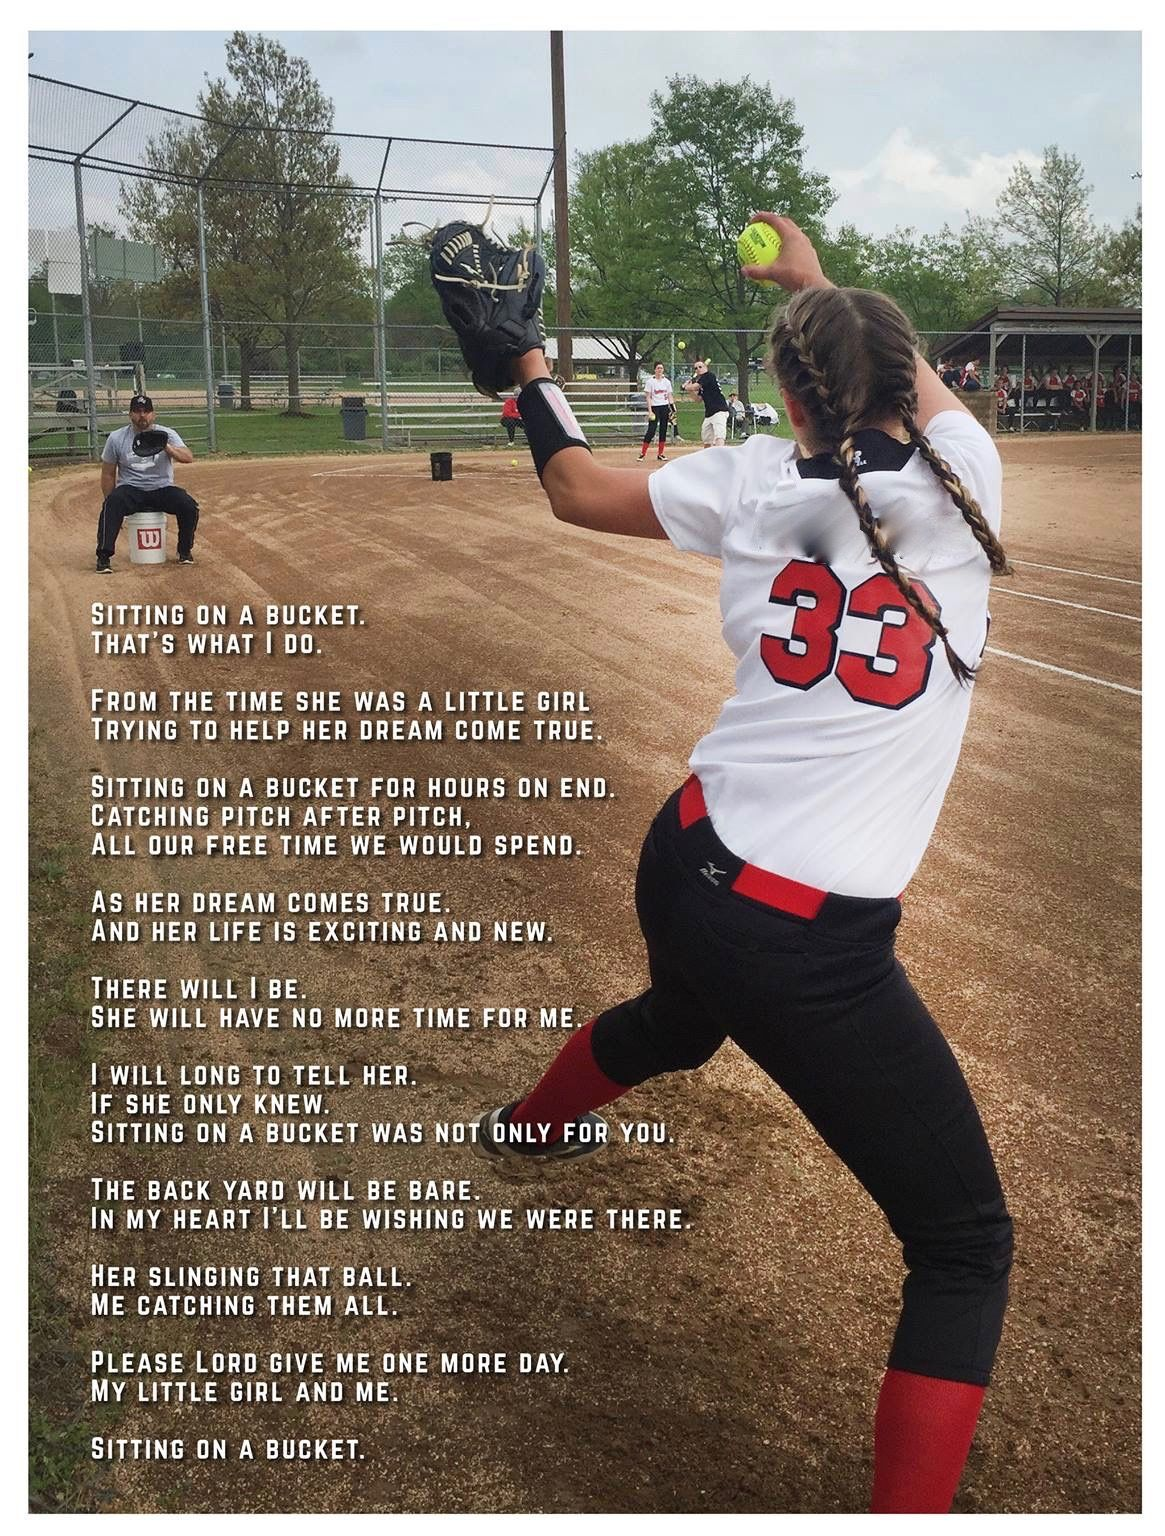 001 Why I Love Softball Essay Unforgettable Full